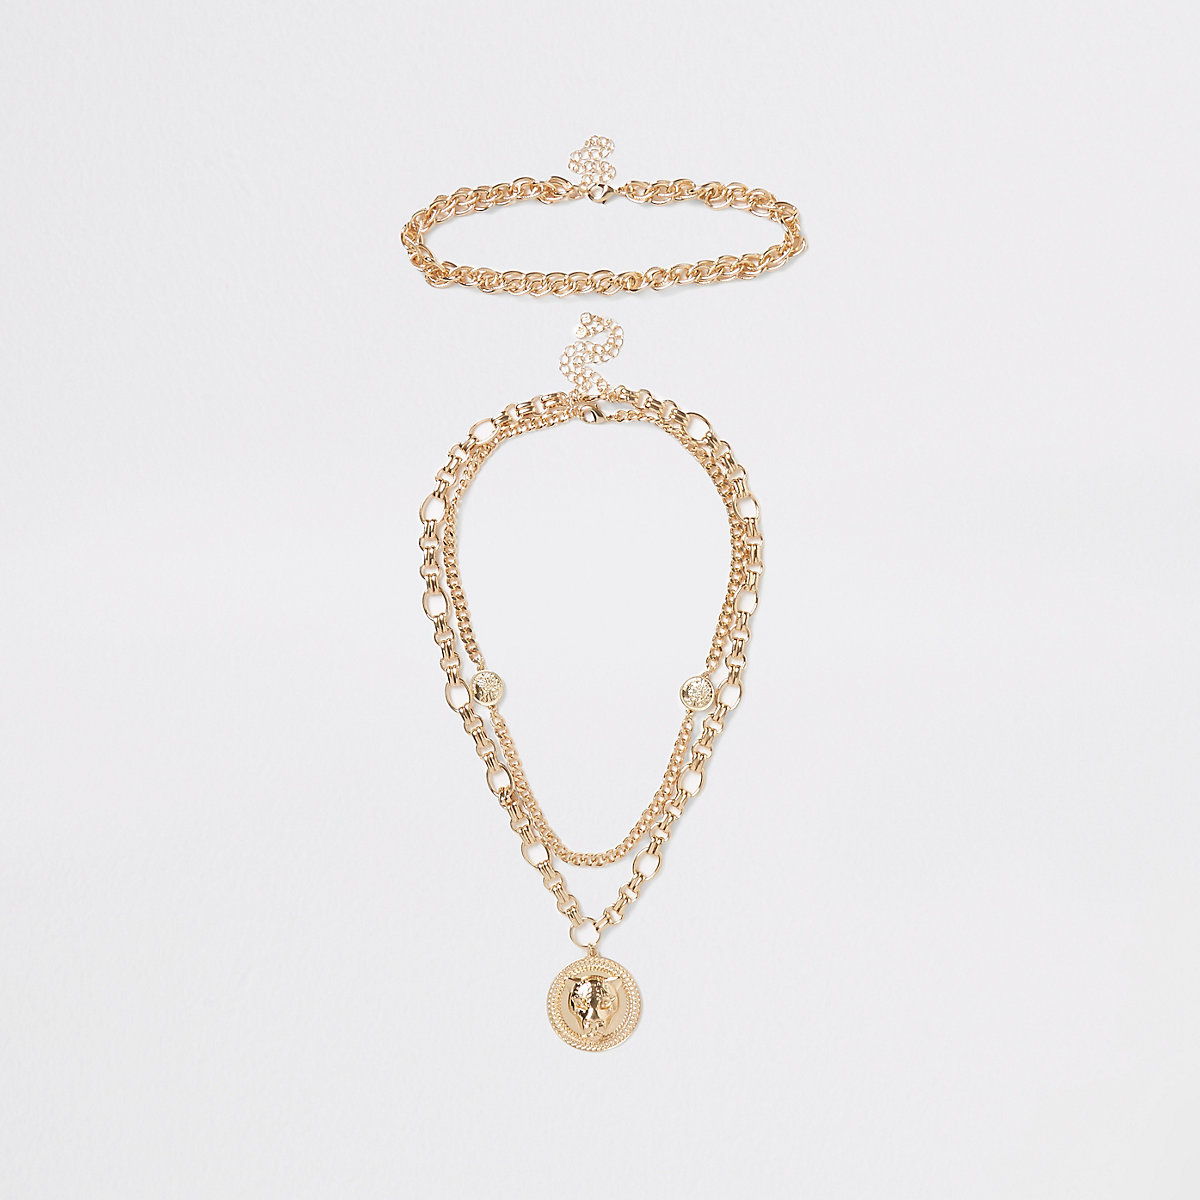 Gold color chunky lion pendant necklace